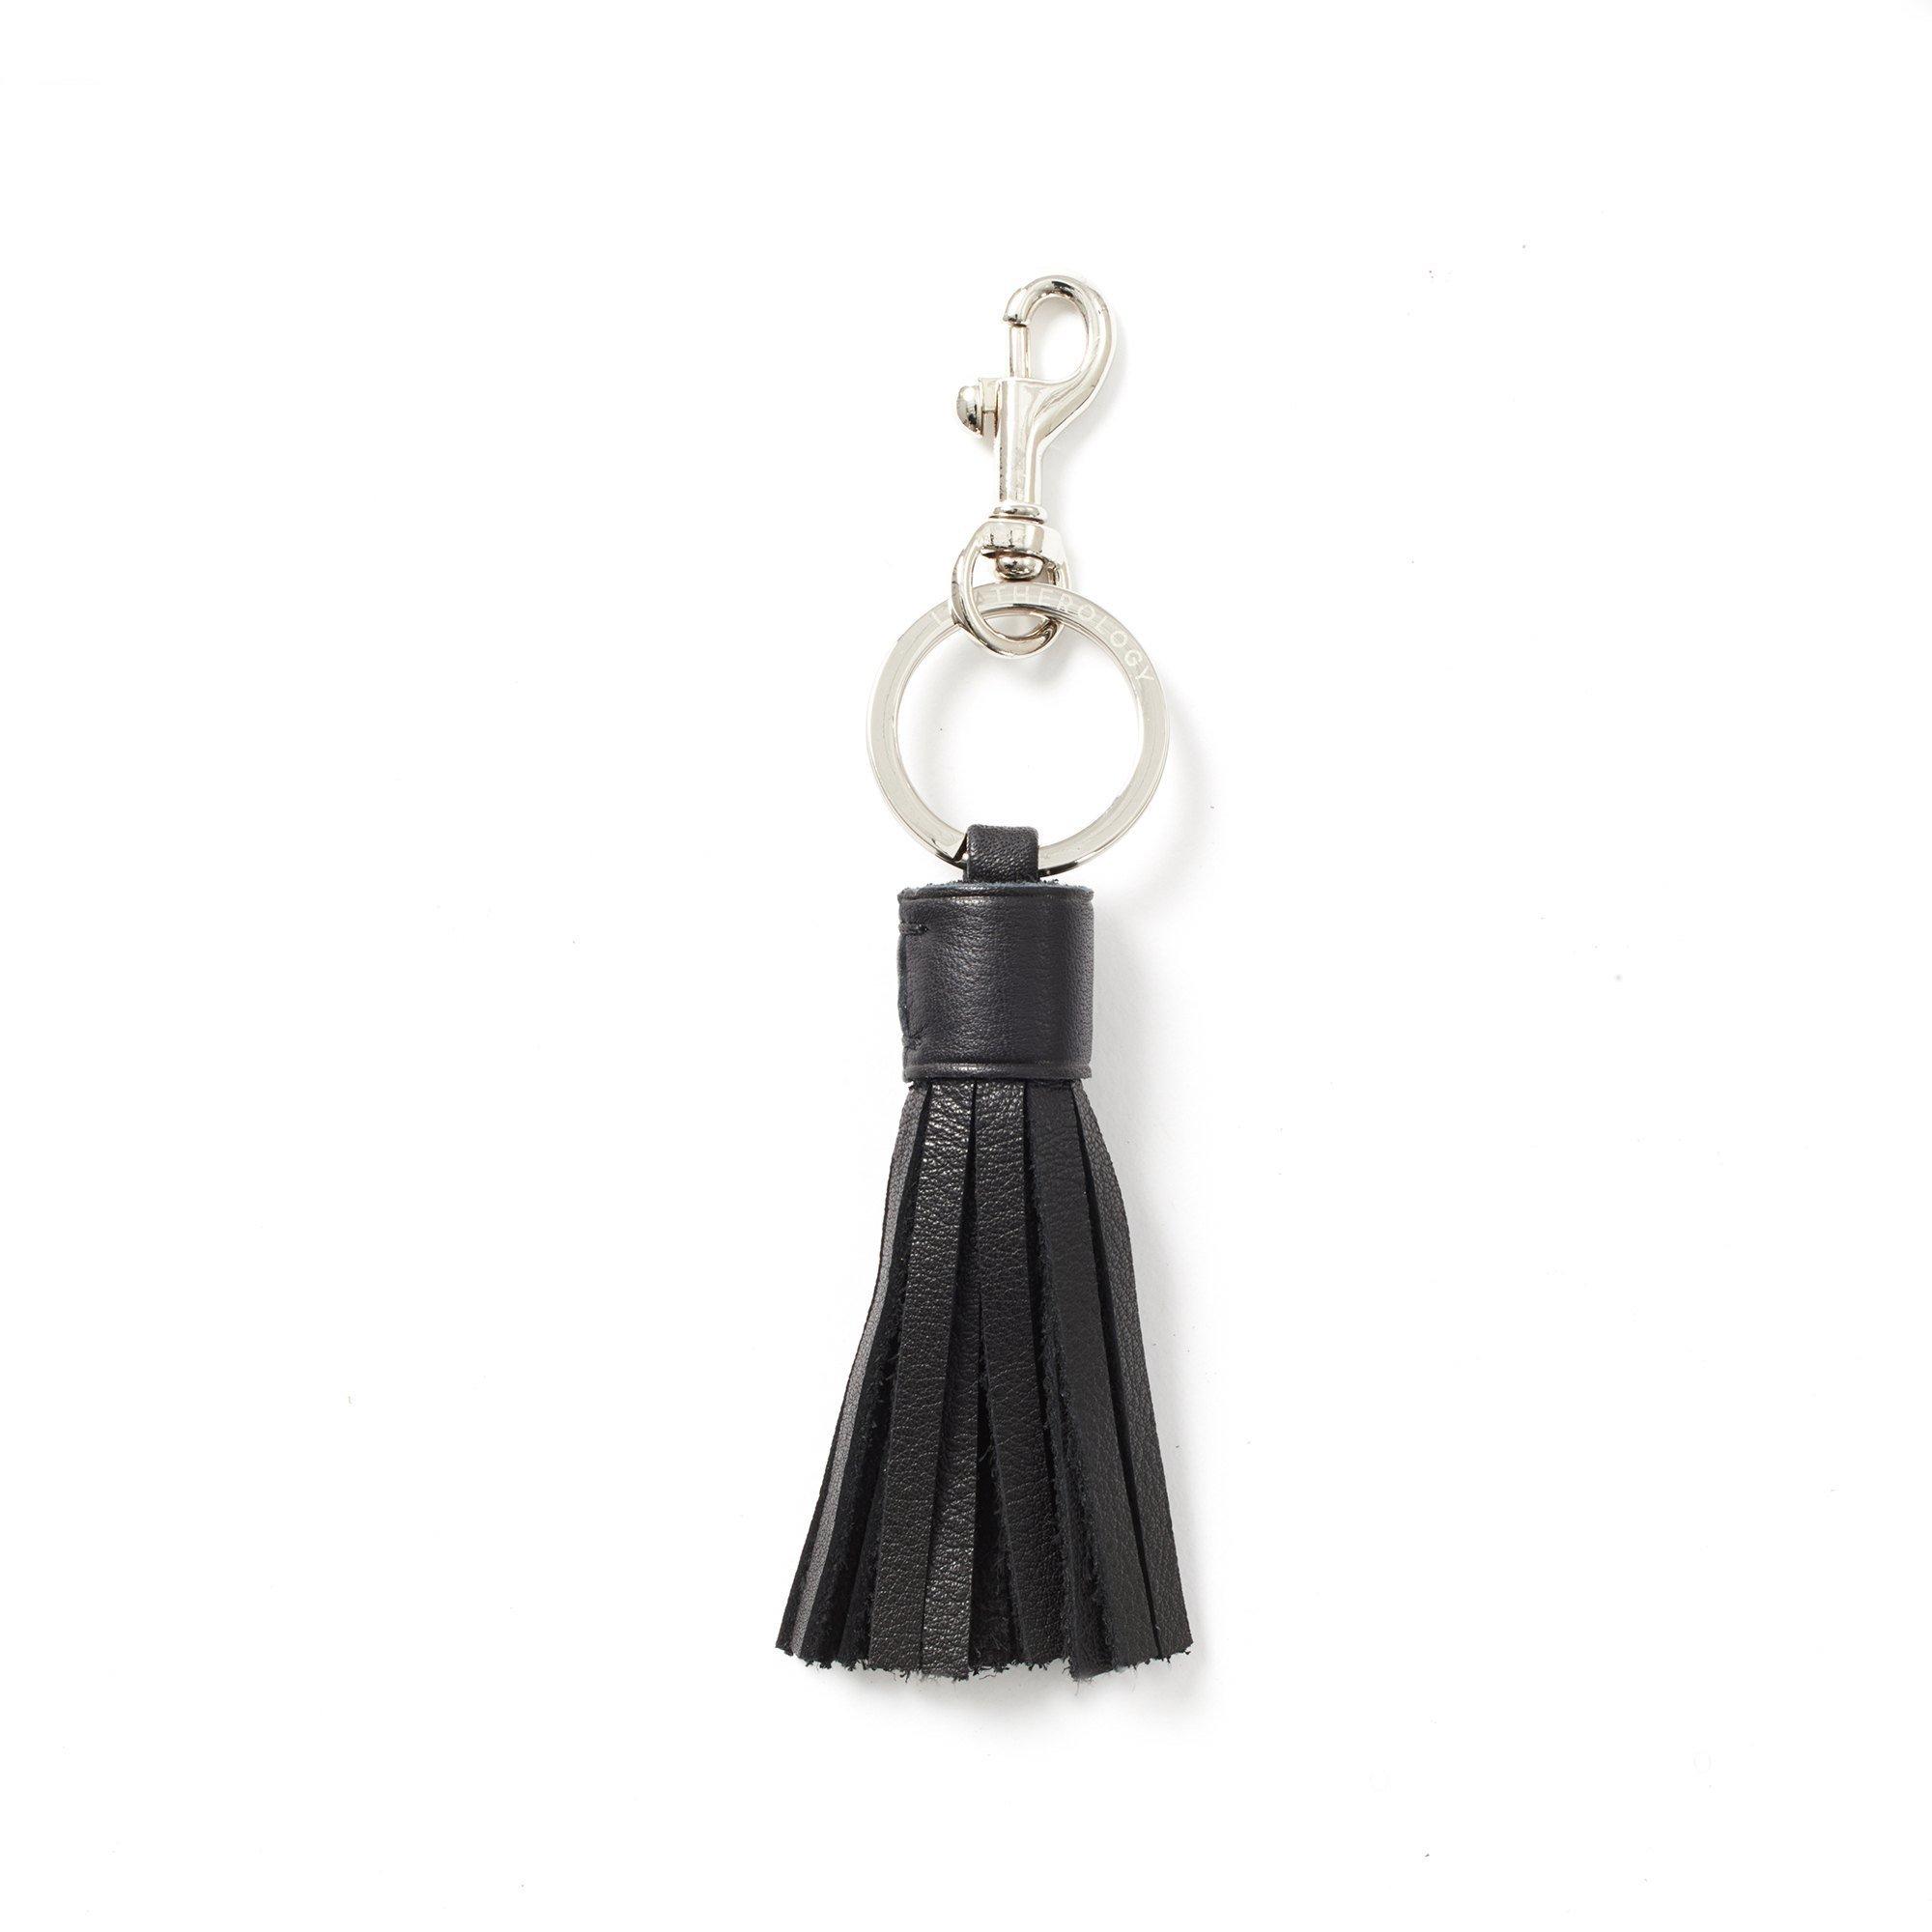 Tassel Key Chain - Full Grain Leather - Black Onyx (black)